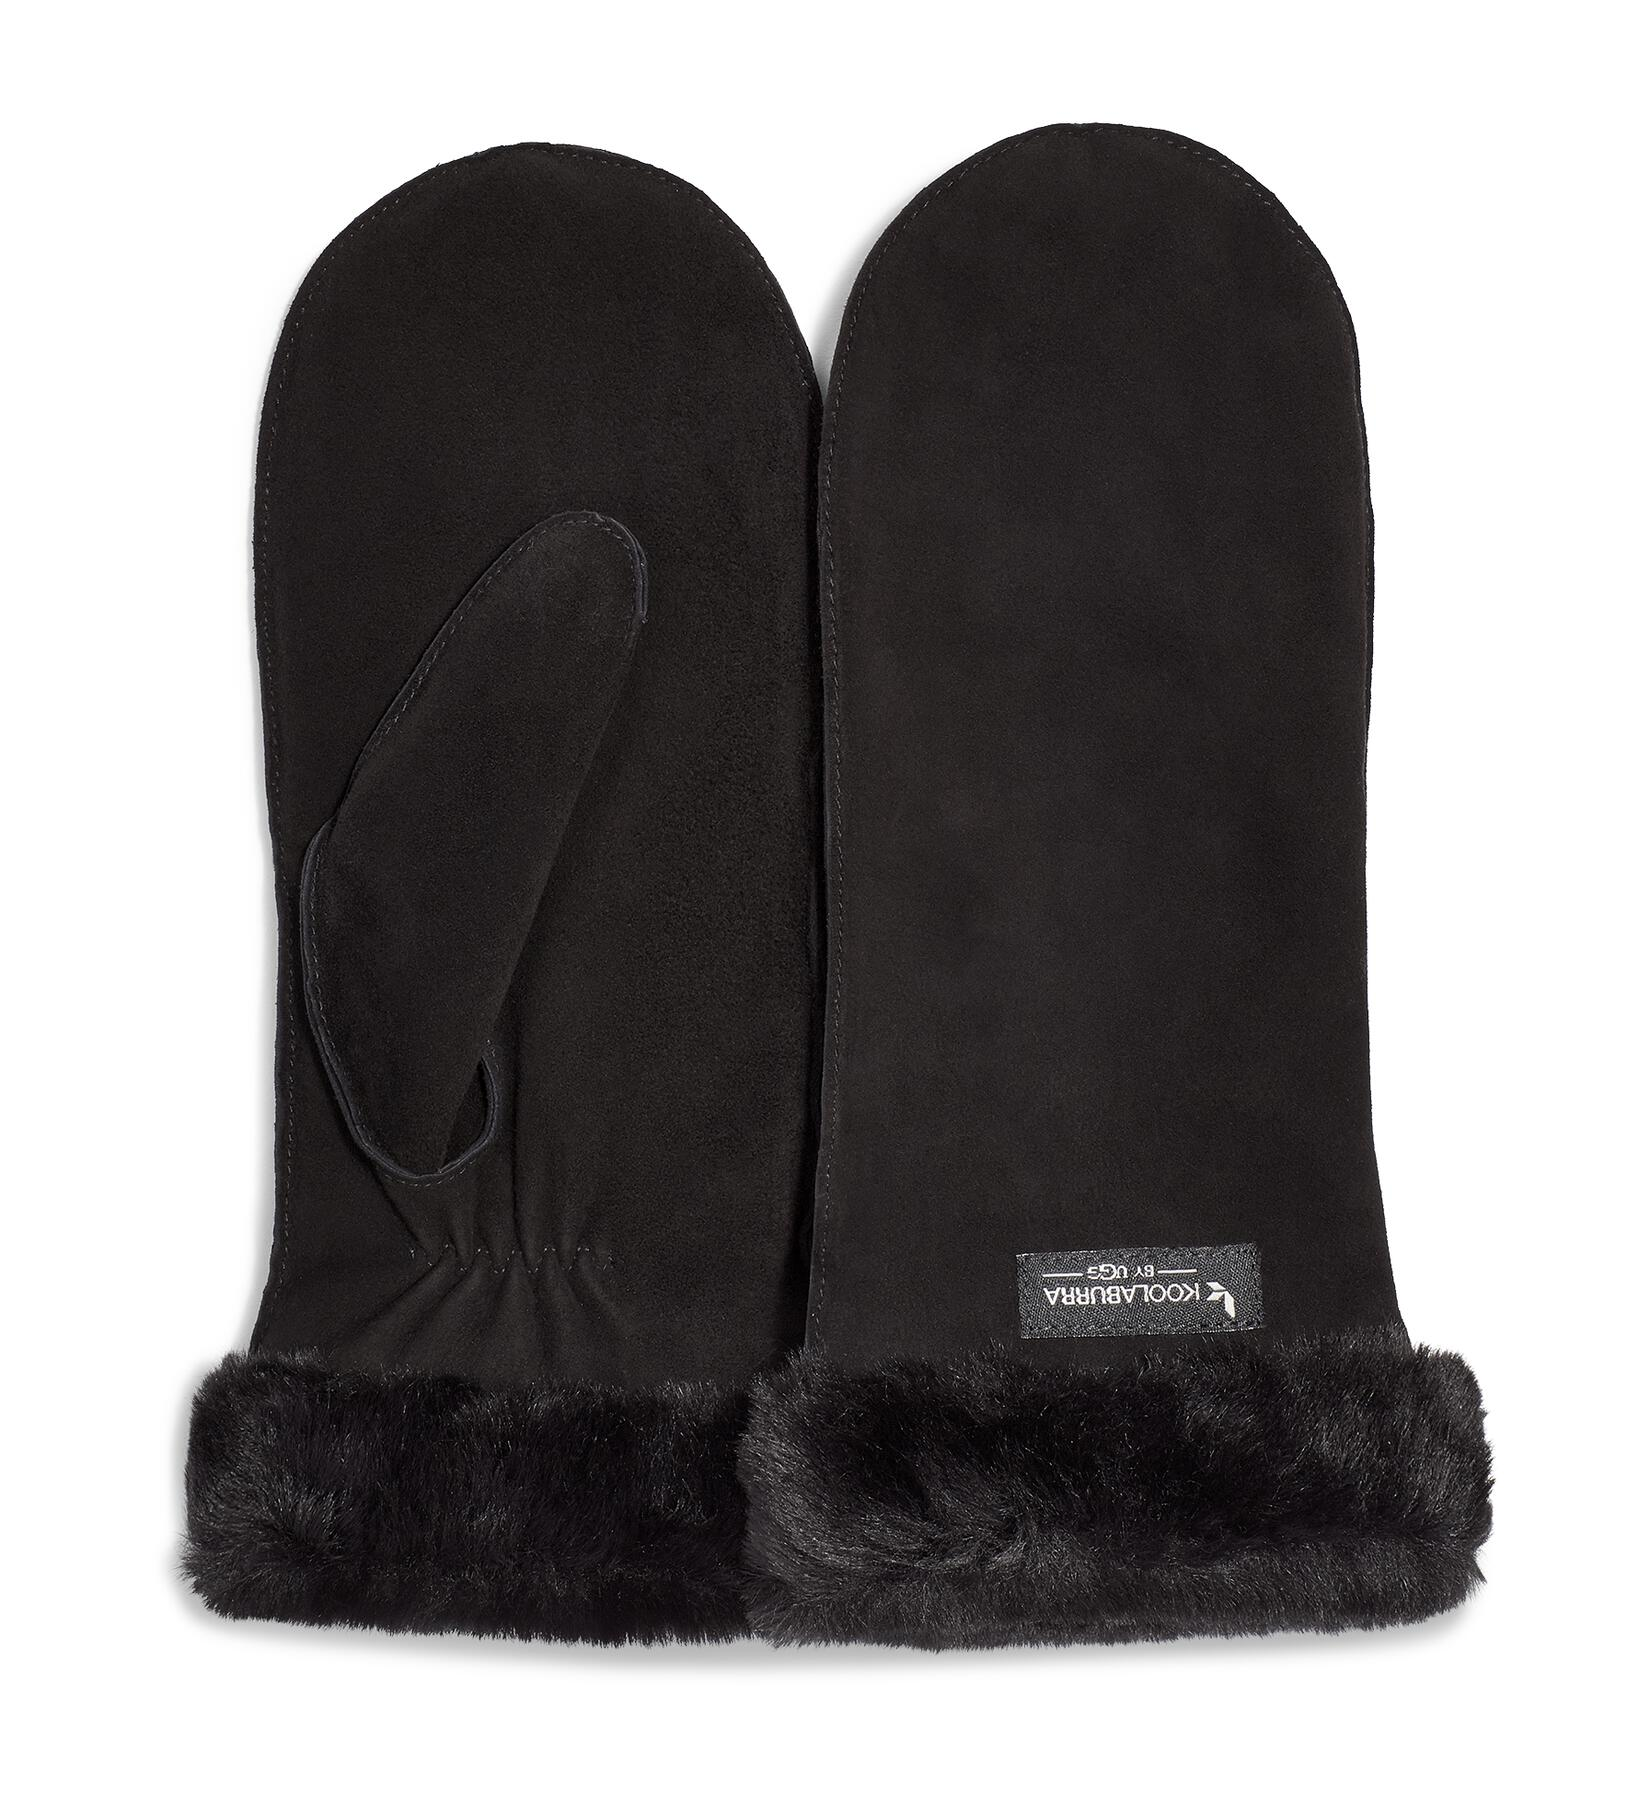 Mitten with Faux Fur Cuff